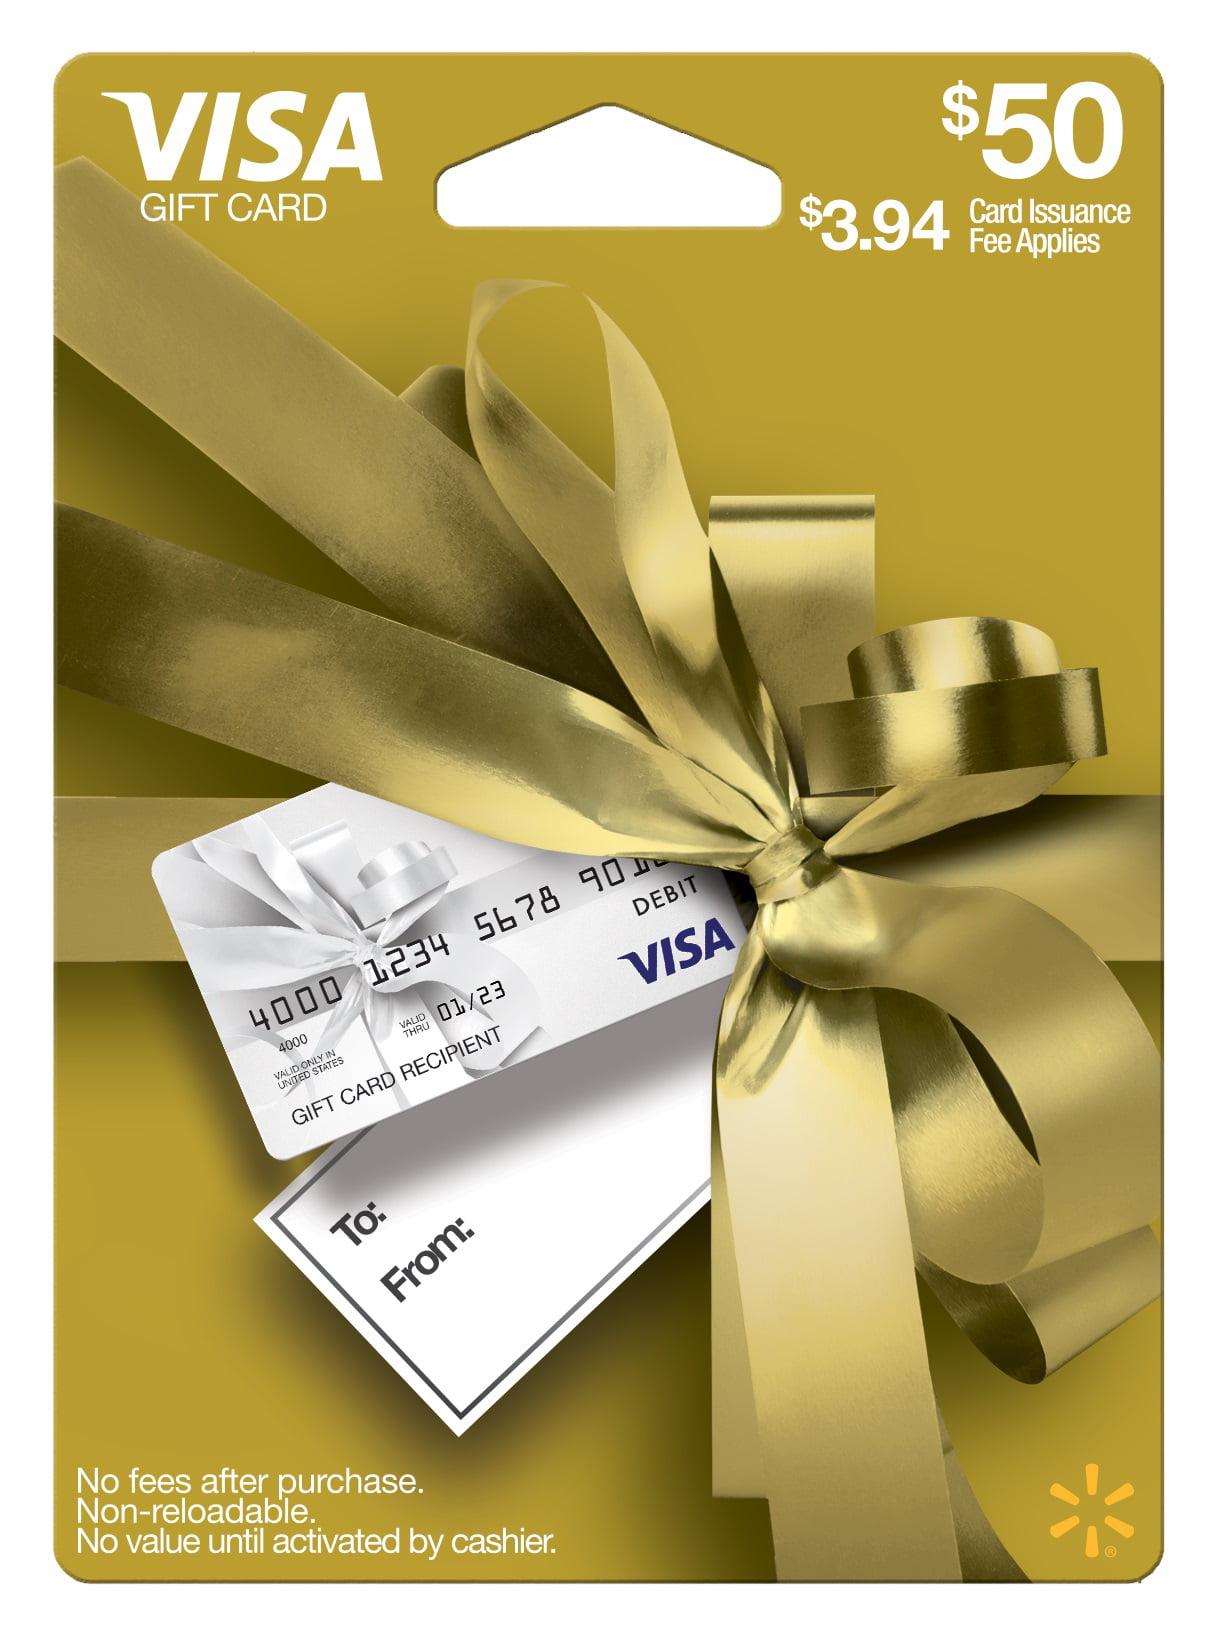 Visa Giftcard Wmt Ed Gc $9 Gold Gdb